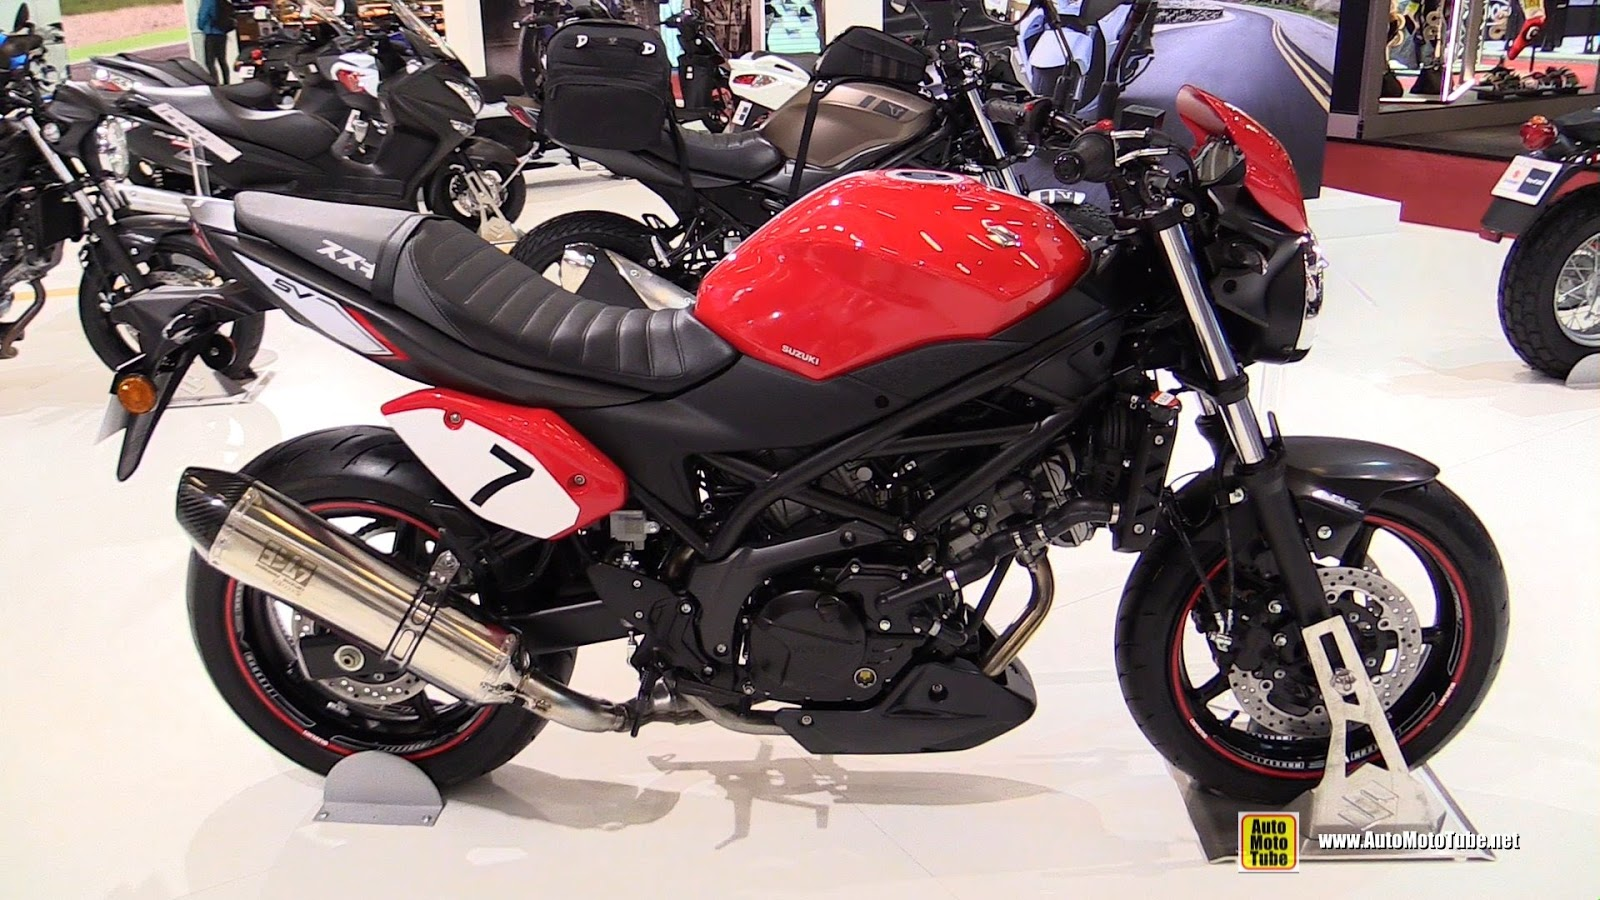 2017 suzuki sv650 naked review news motobikes news motobikes. Black Bedroom Furniture Sets. Home Design Ideas